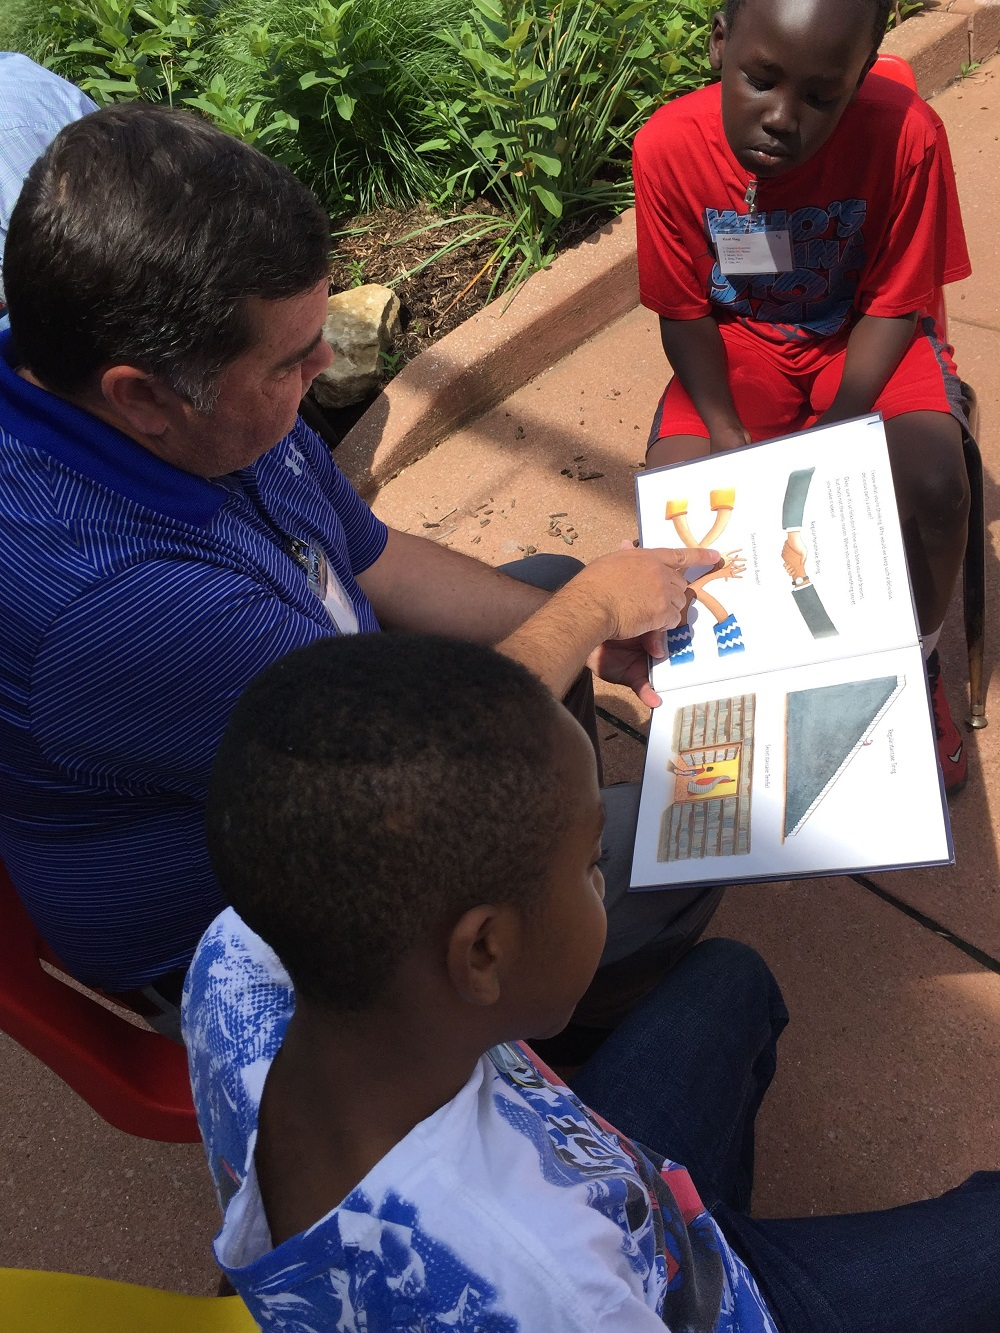 Volunteer Reader at the Neighborhood Art House